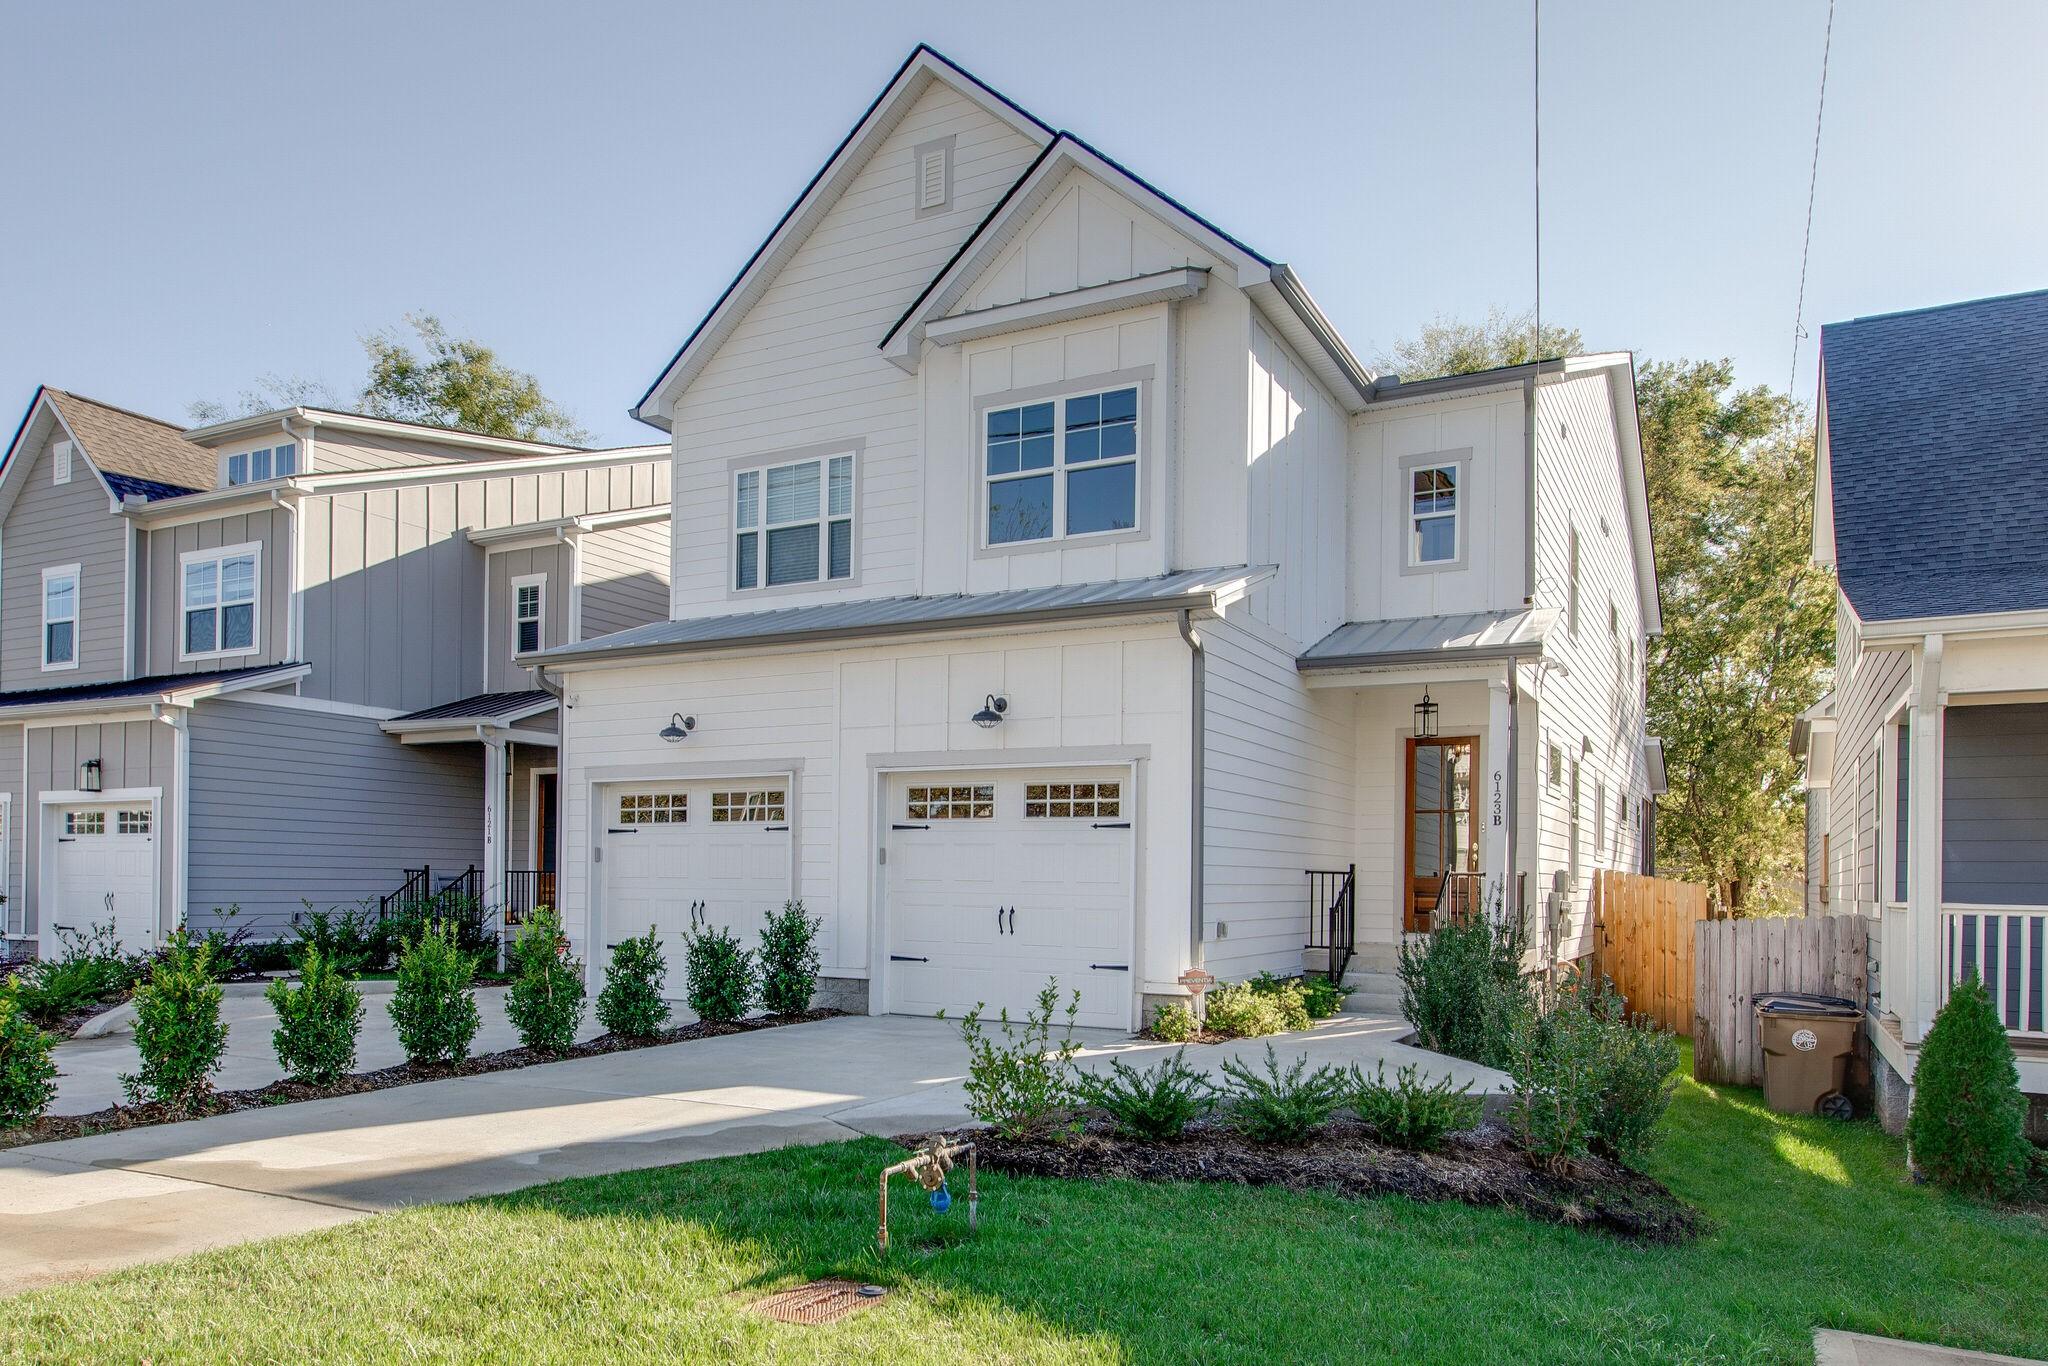 6123 Louisana Street Cotta Real Estate Listings Main Image